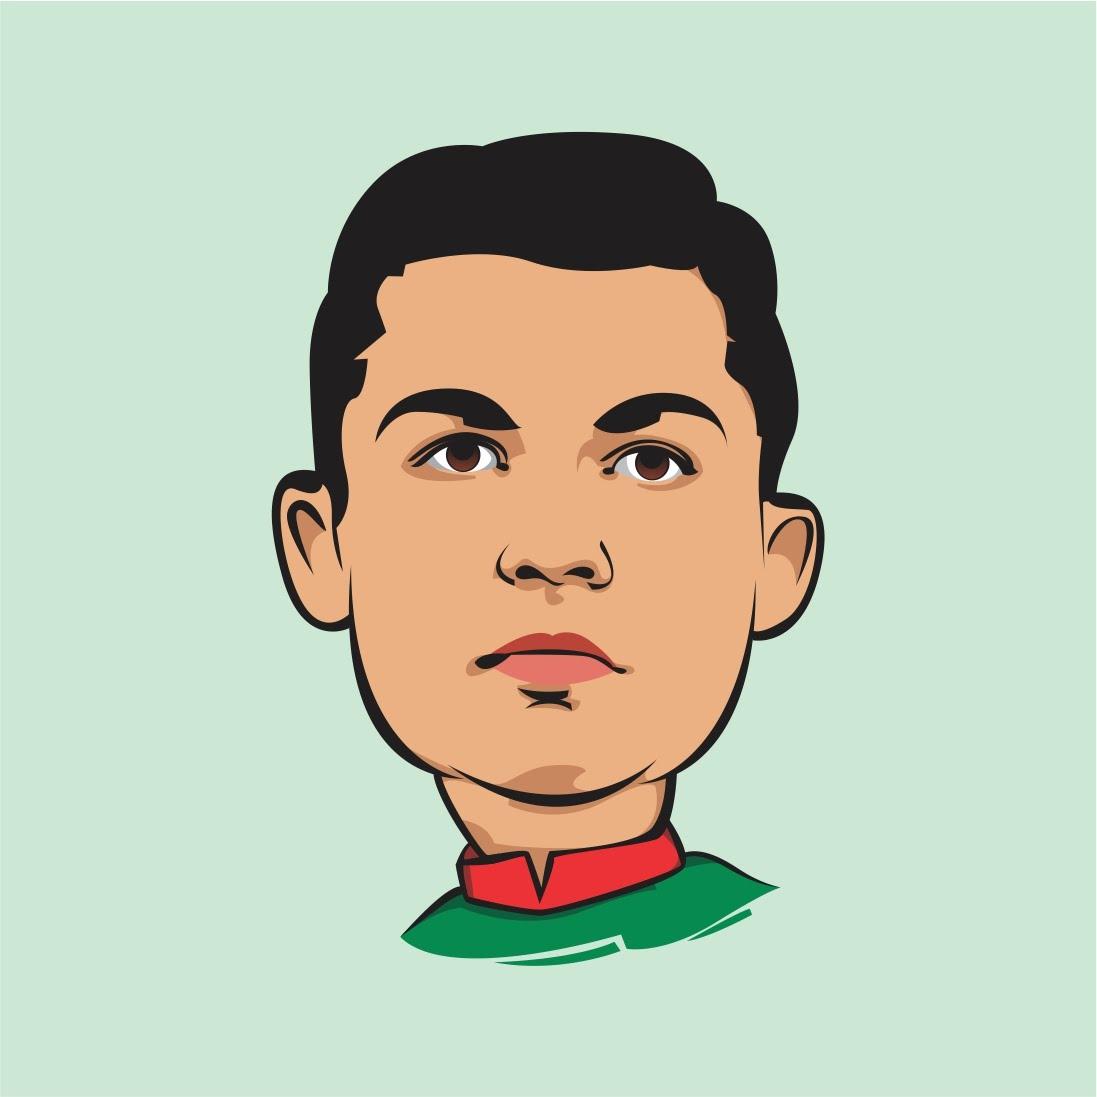 1097x1097 How To Draw Simple Cartoon In Coreldraw Cristiano Ronaldo